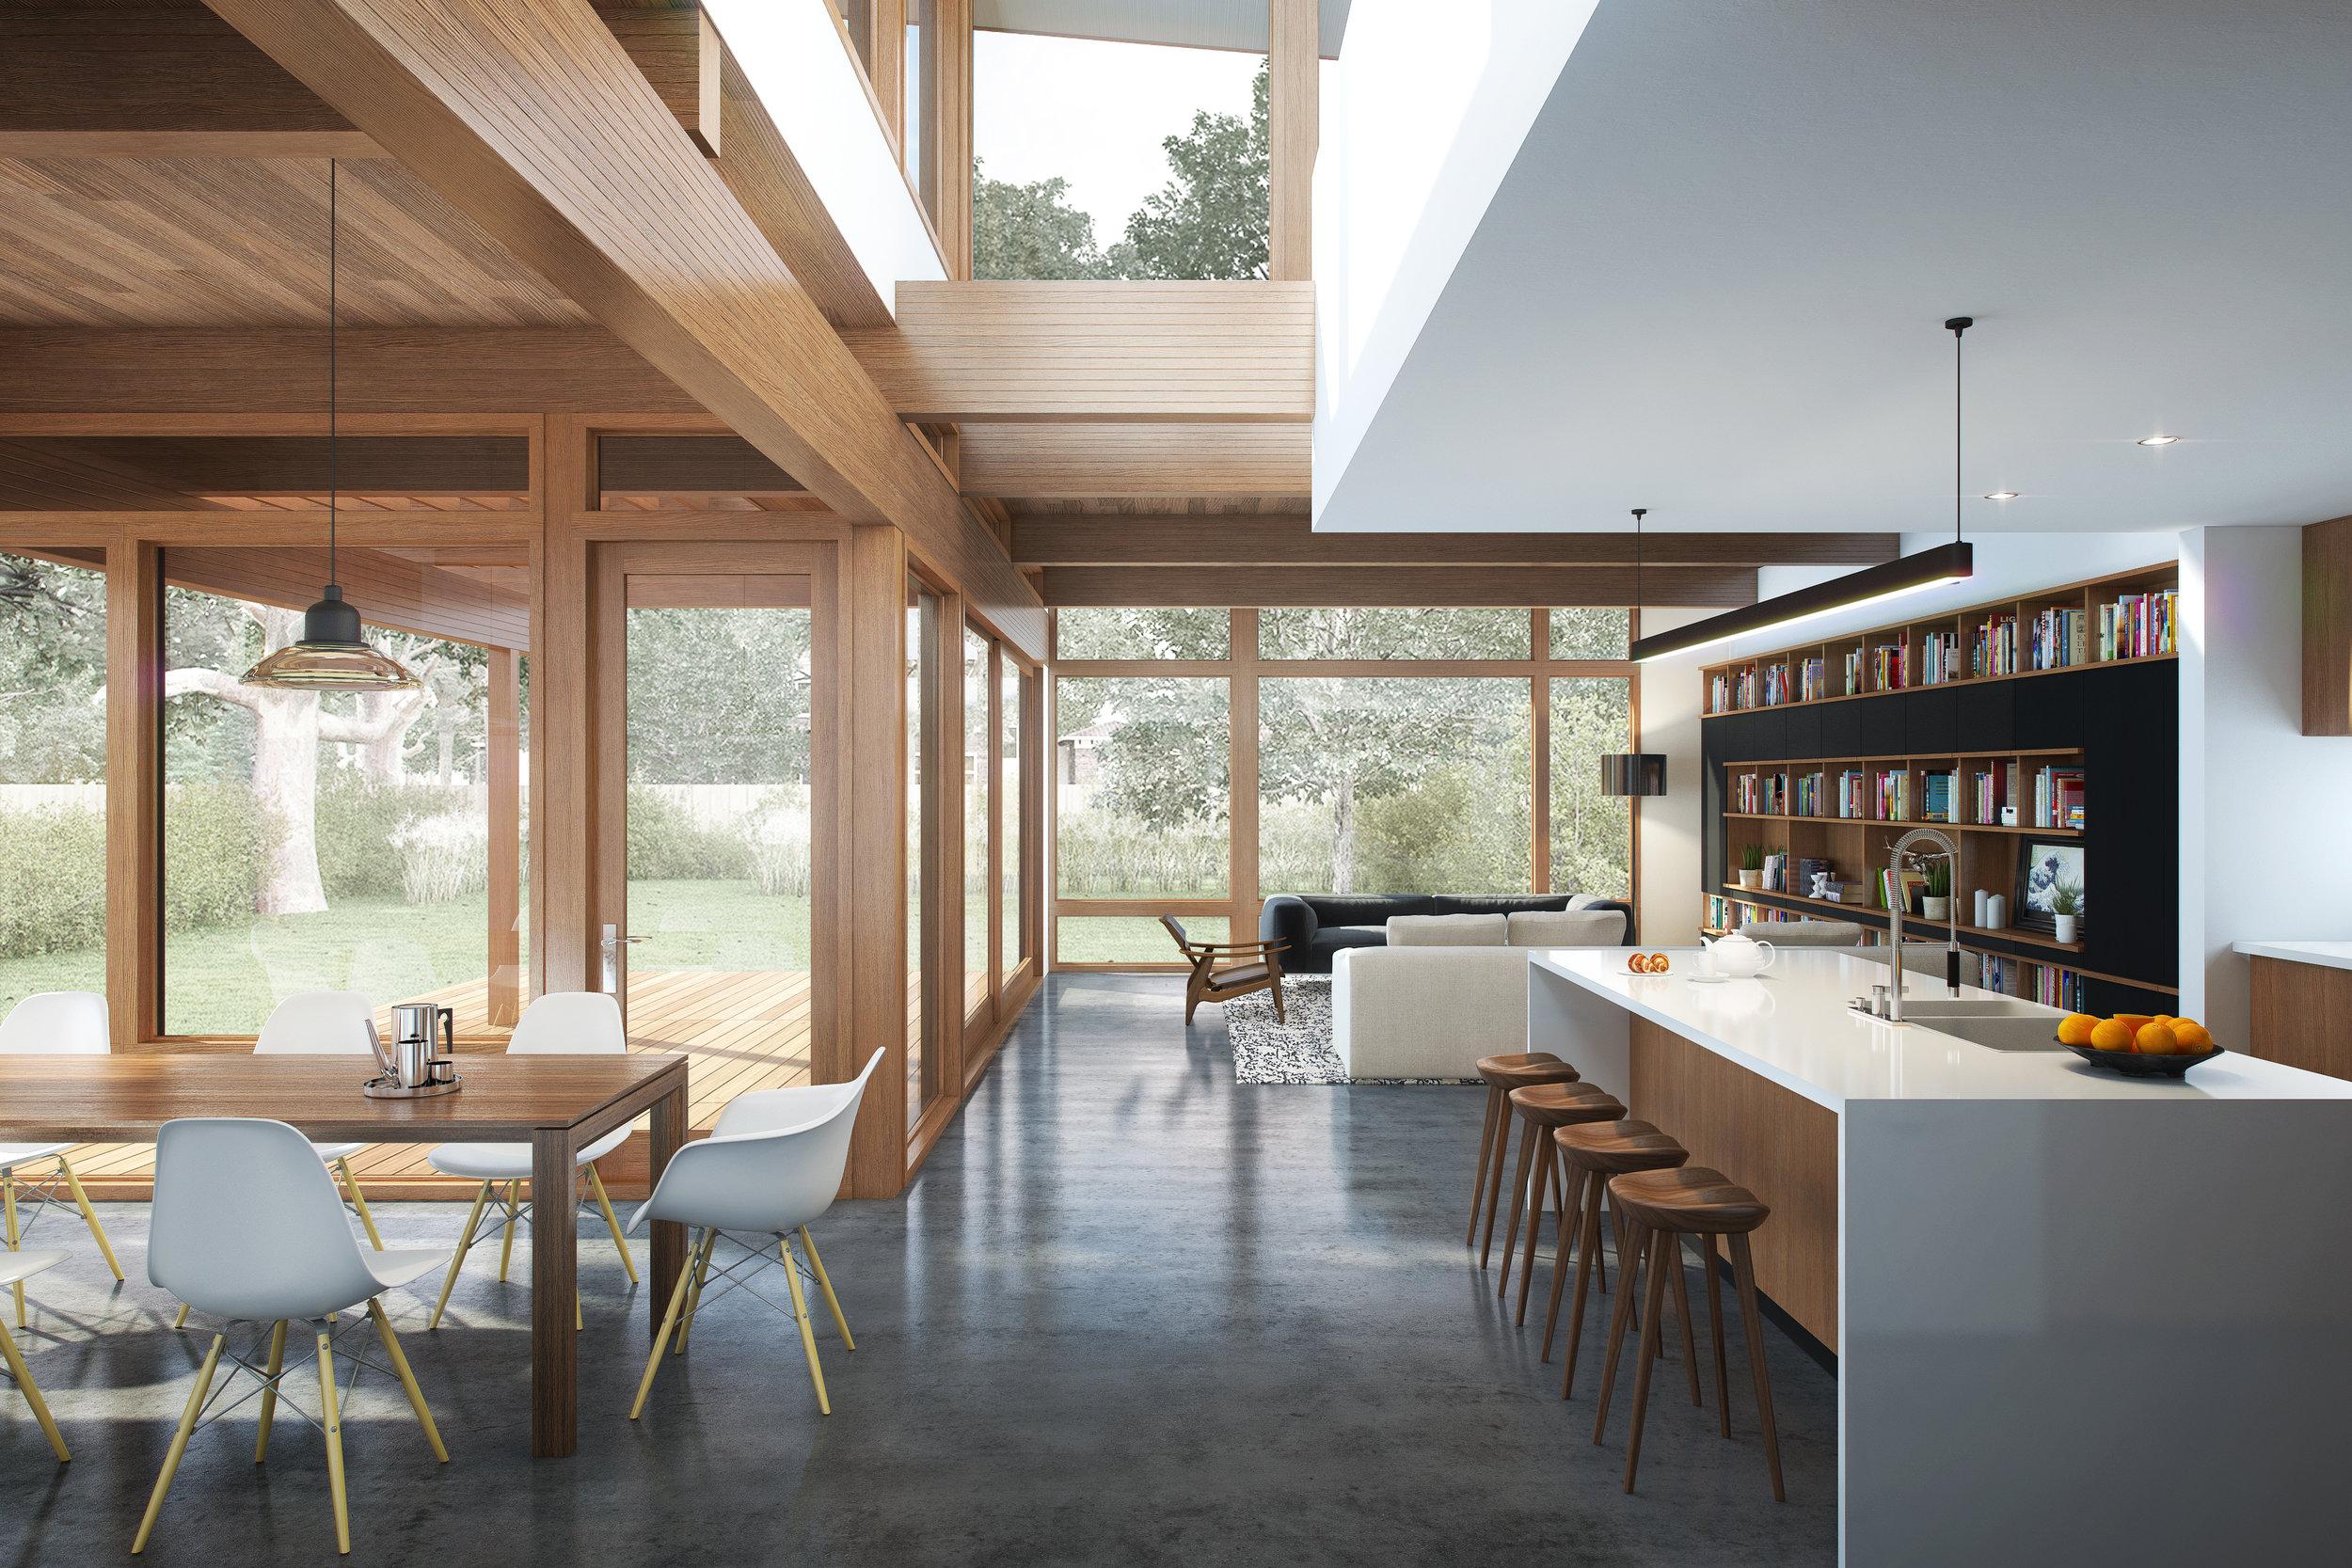 turkel_design_modern_prefab_home_axiom_series_rendering_axiom2340_interior.jpg